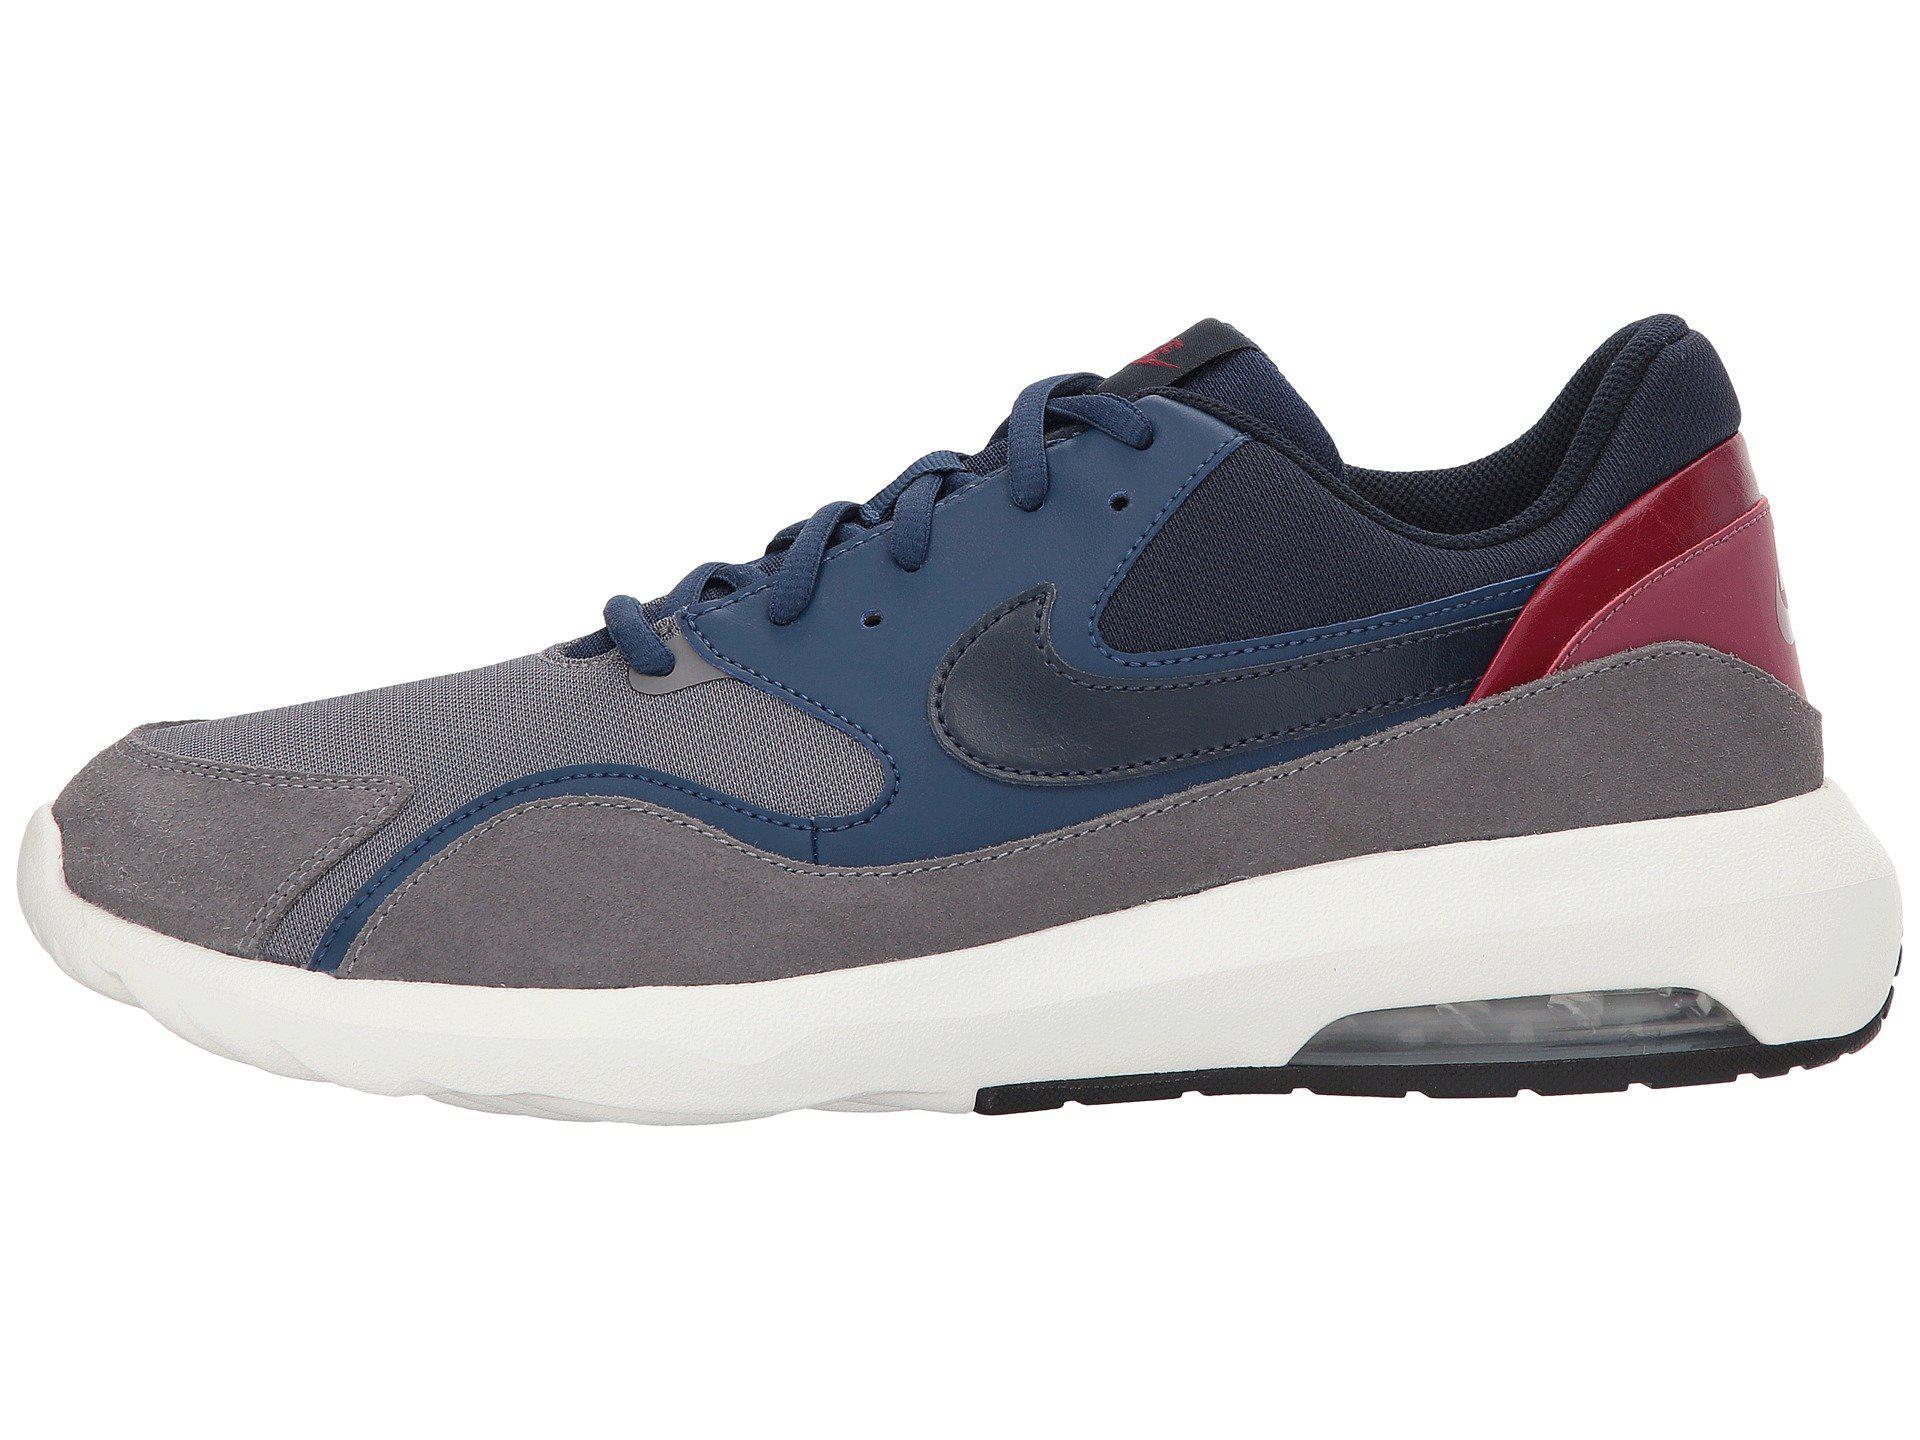 Air Max Nostalgic (gunsmokeobsidiannavyvintage Wine) Men's Running Shoes